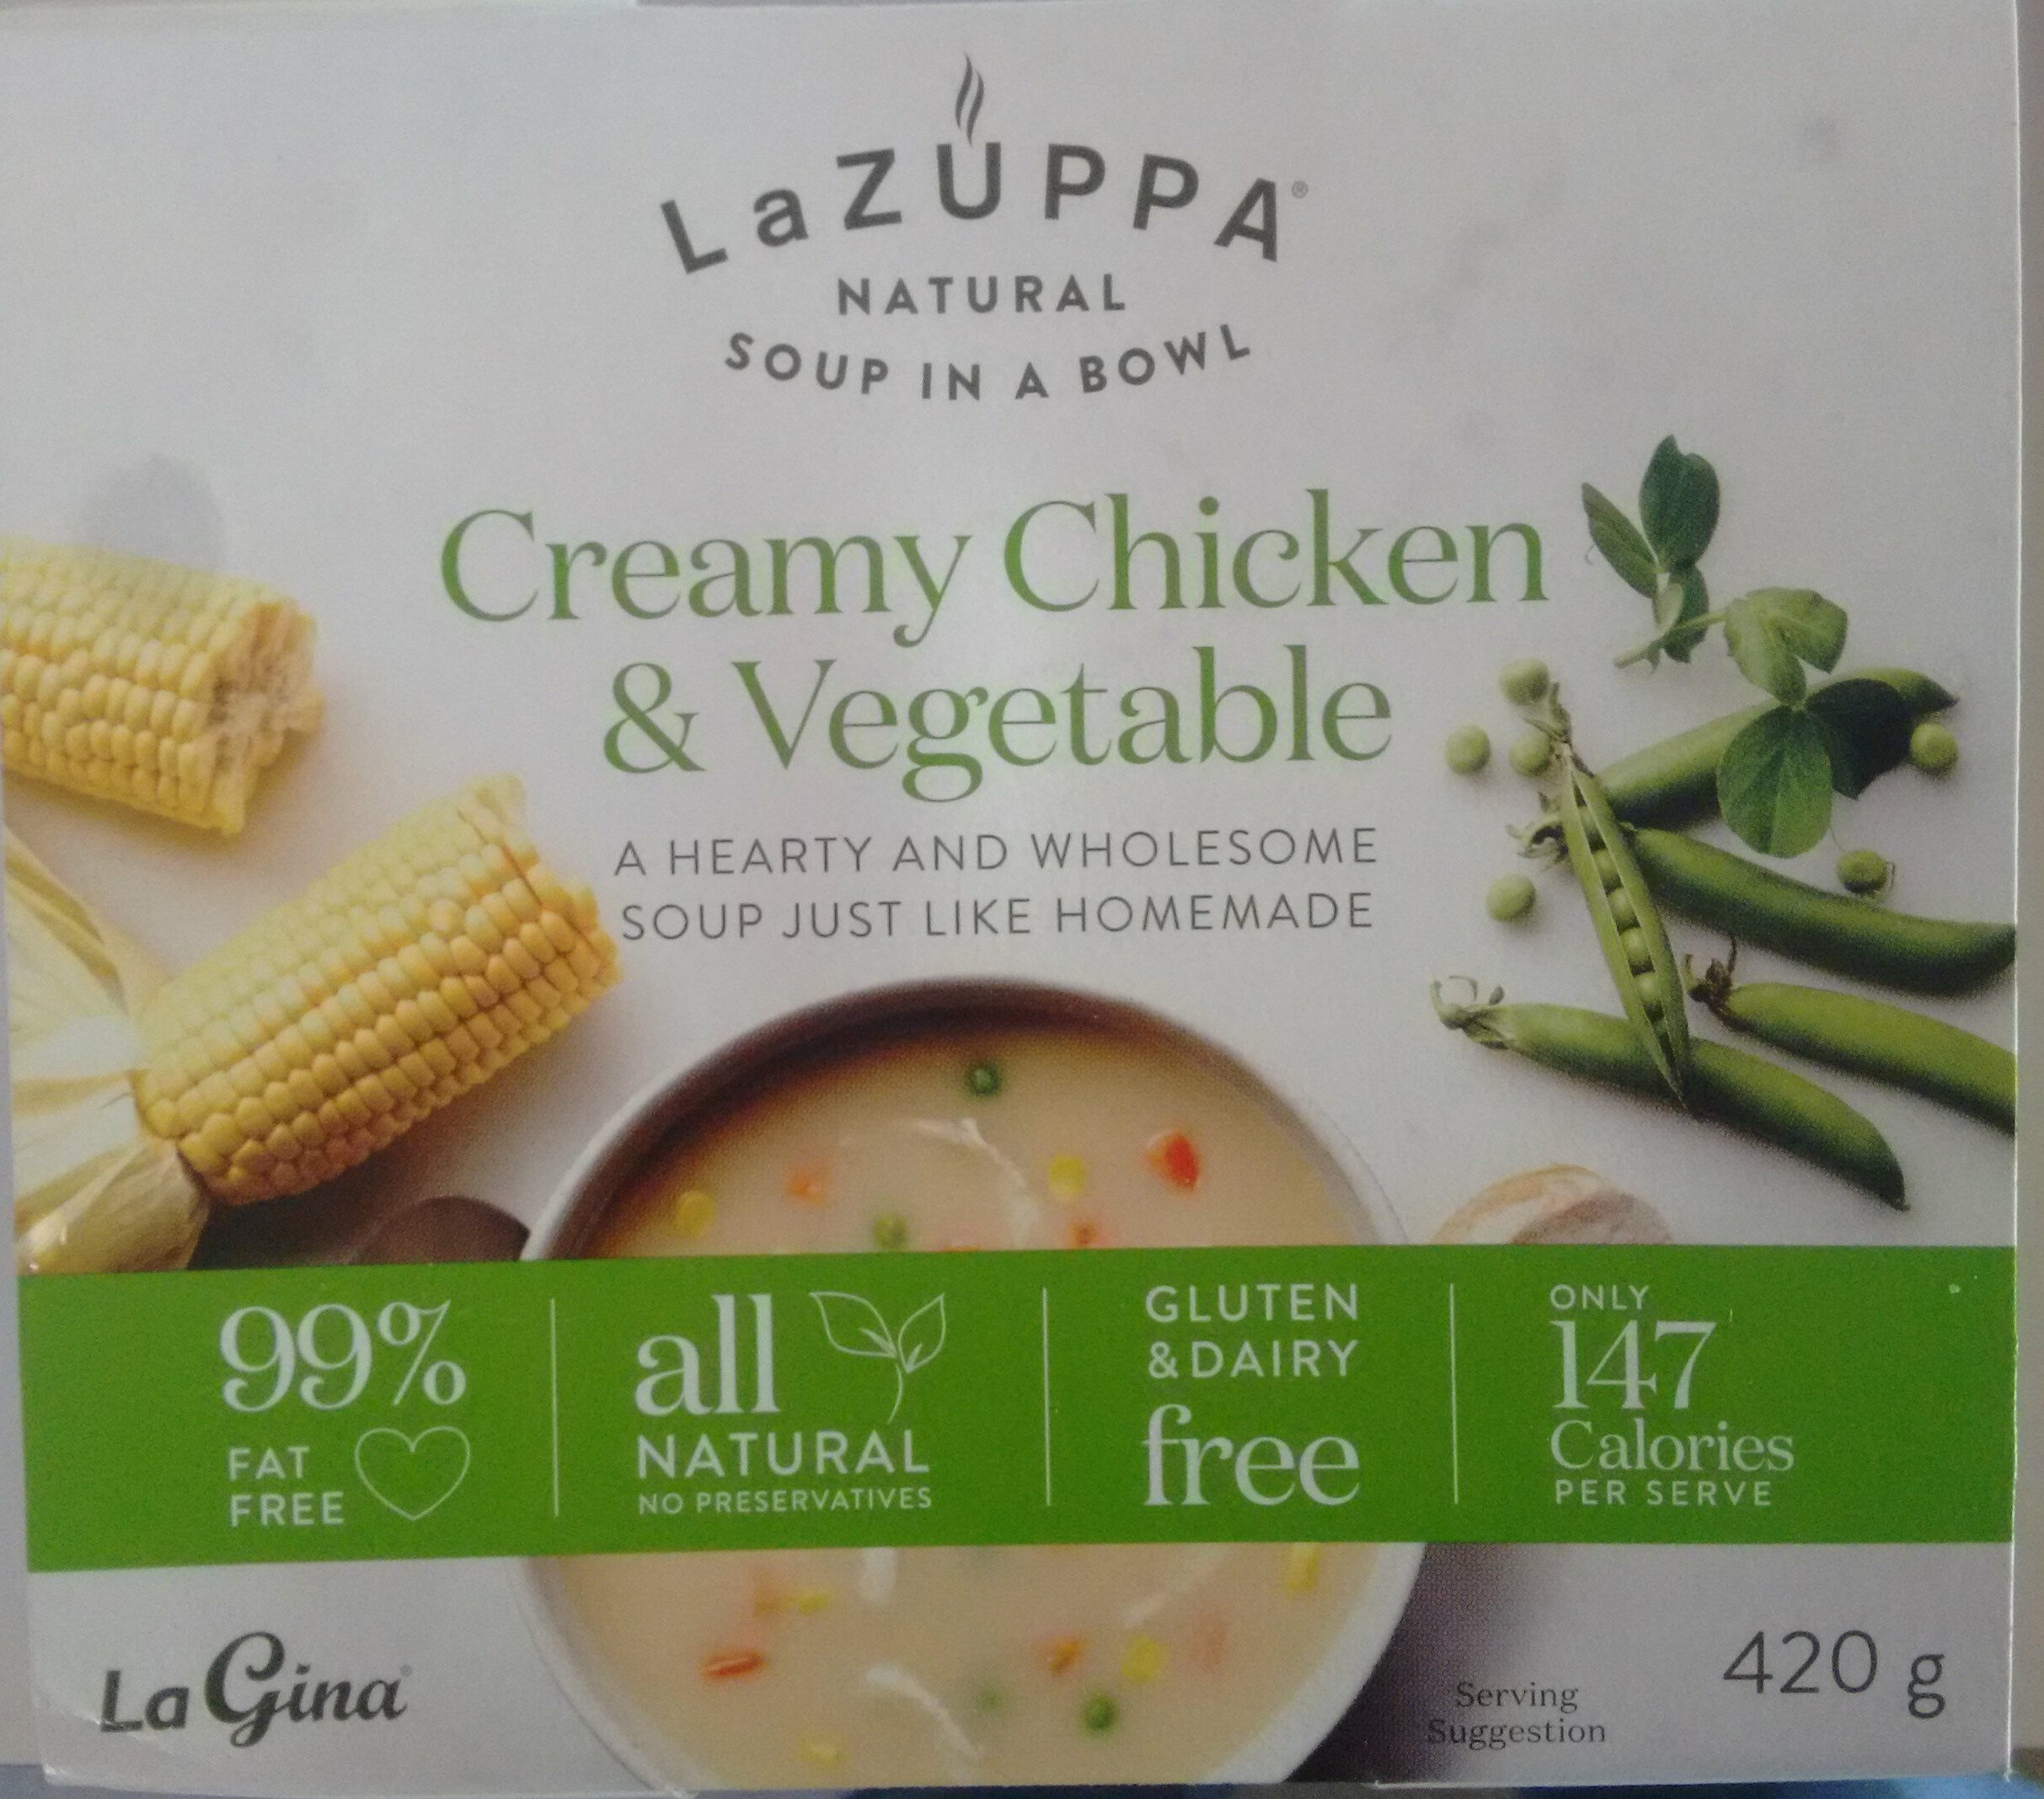 Creamy Chicken & Vegetable Soup - Product - en